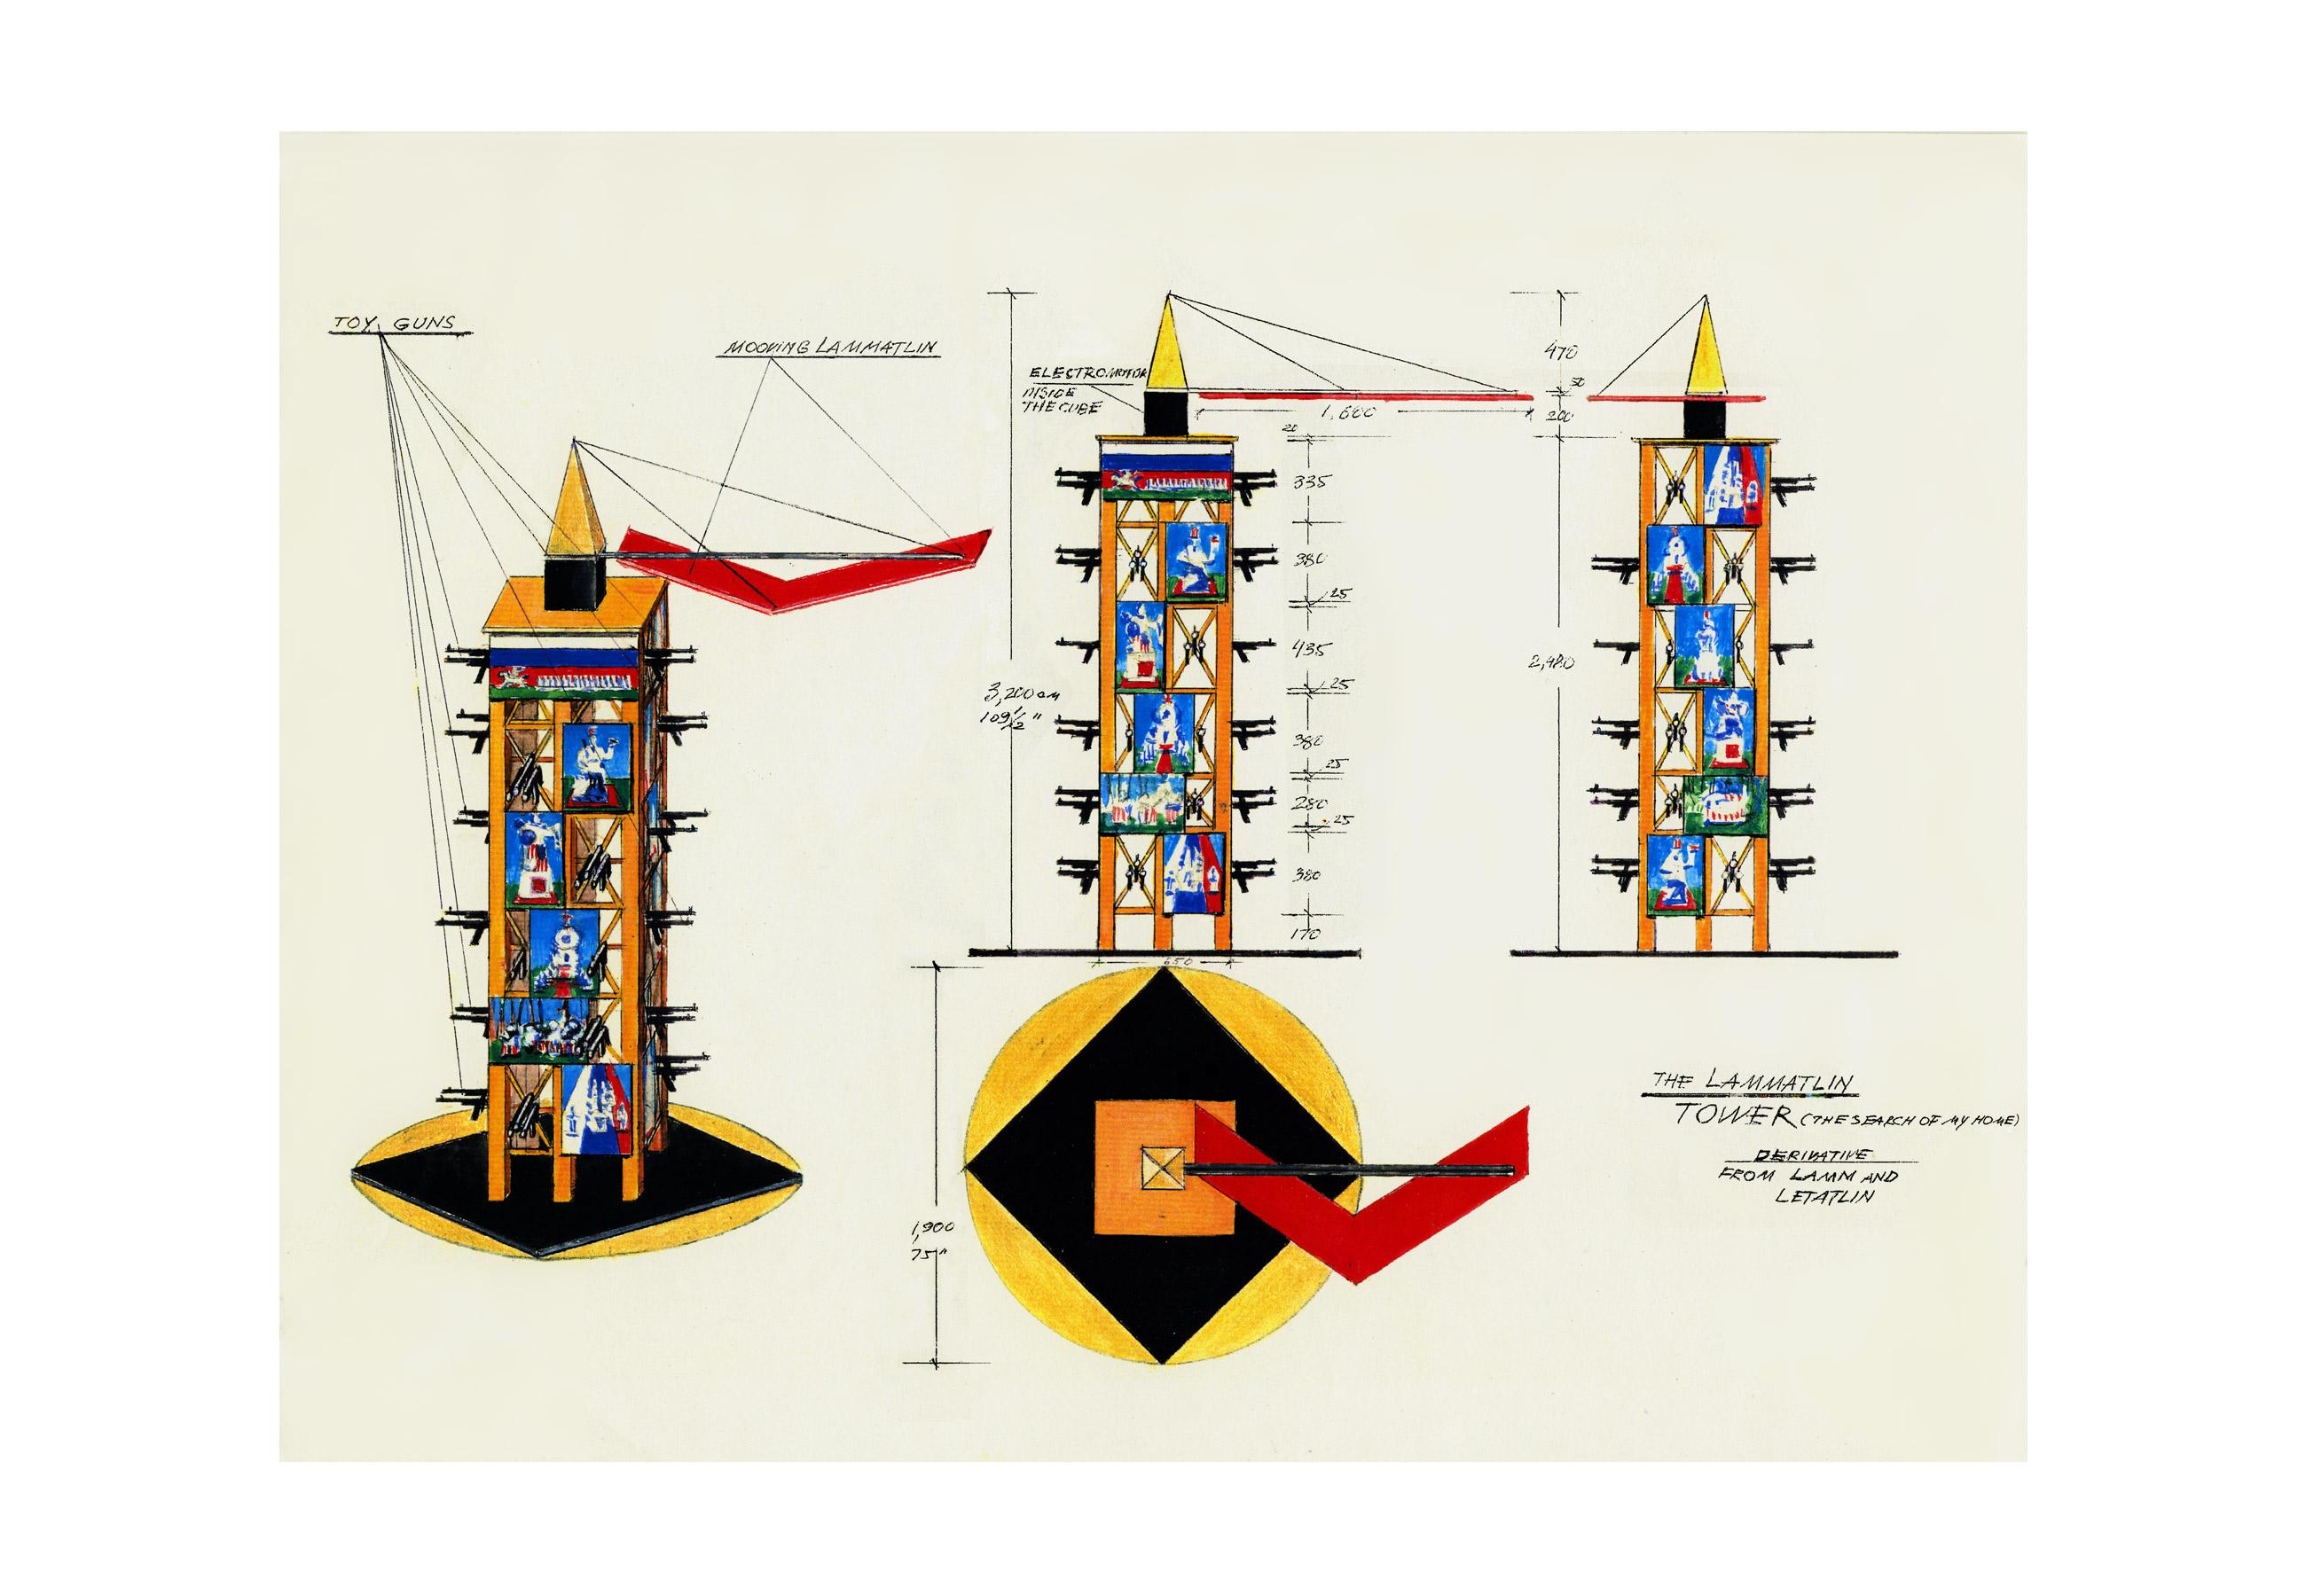 Lamm-Portfolio-1990-1996-35.jpg